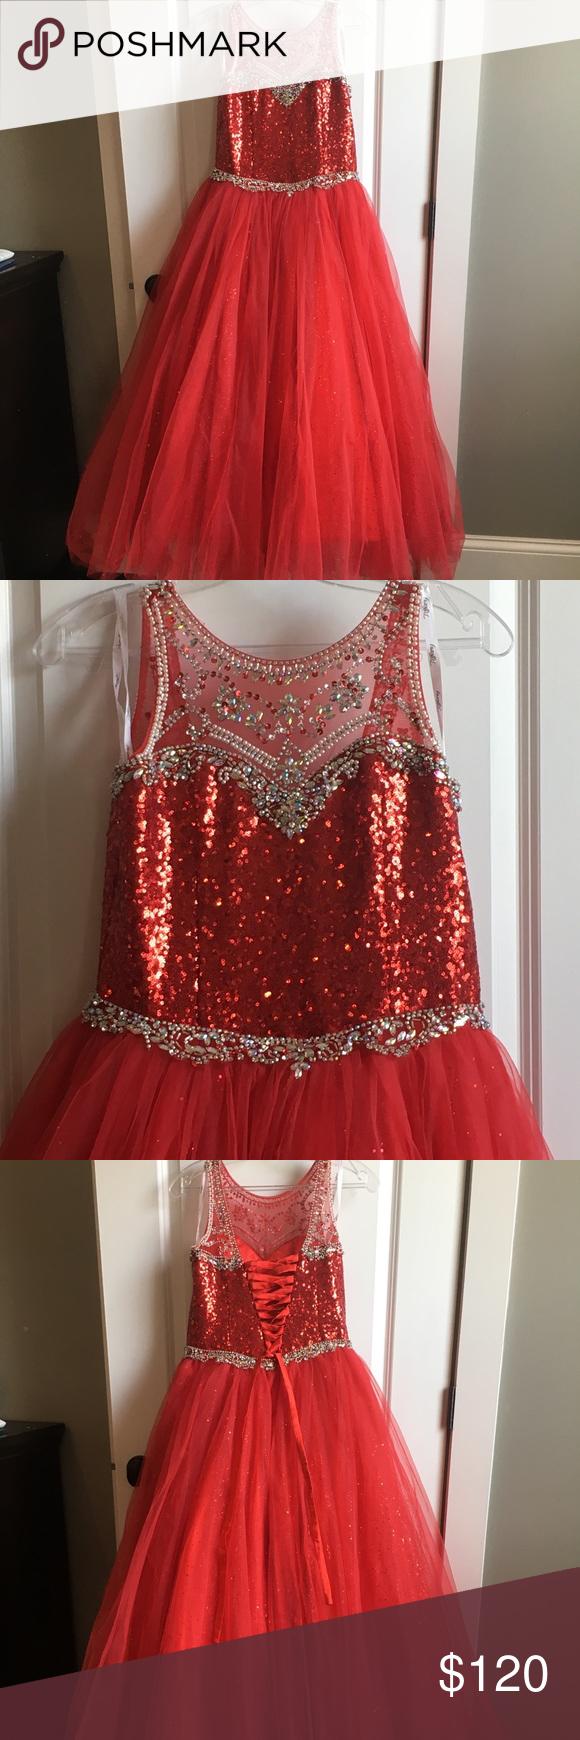 d54632fea78c Tiffany Princess Girl s Sz 12 Formal Dress Tiffany Princess girl s size 12  formal dress. Unaltered